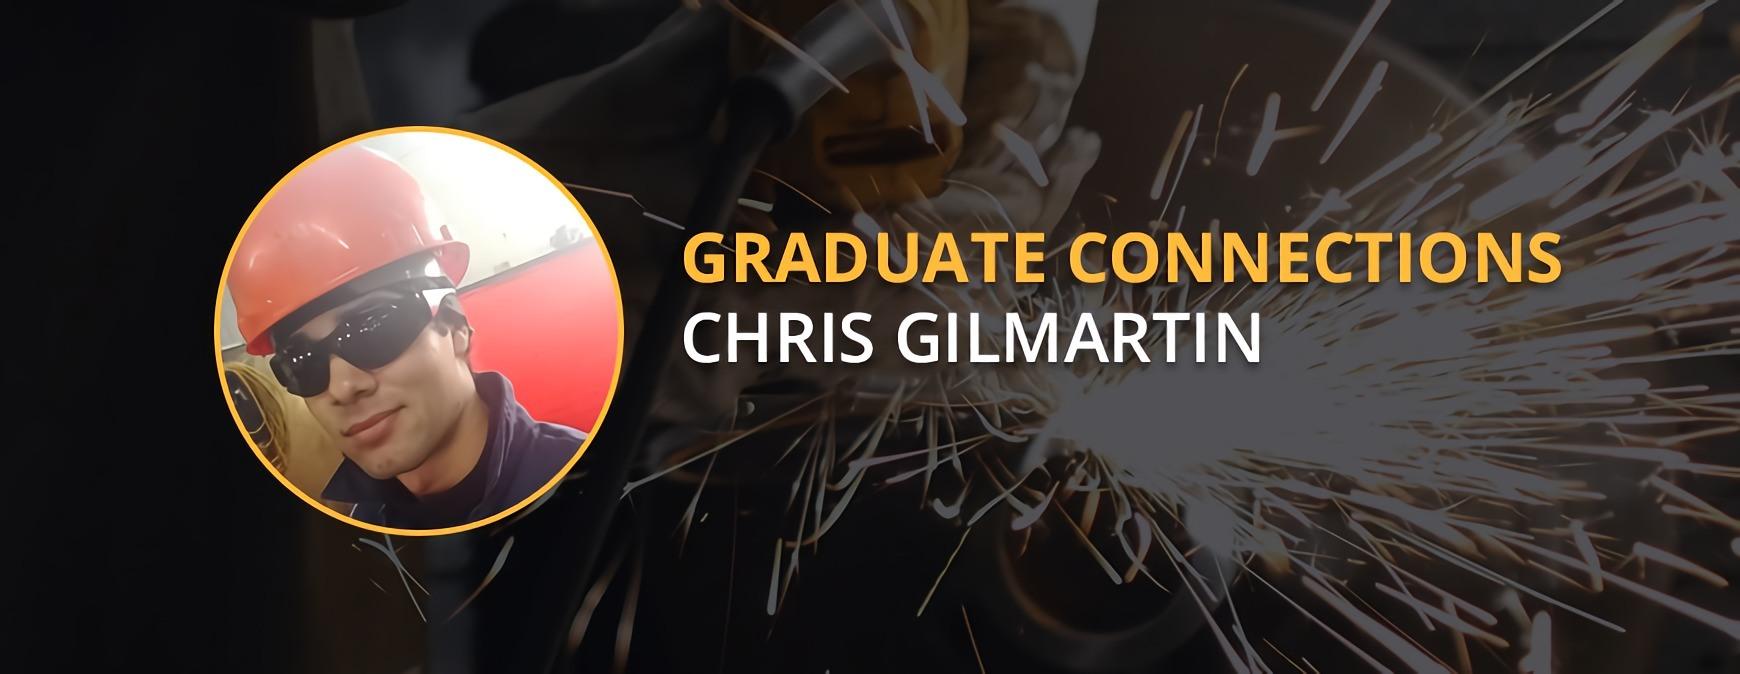 Chris Gilmartin